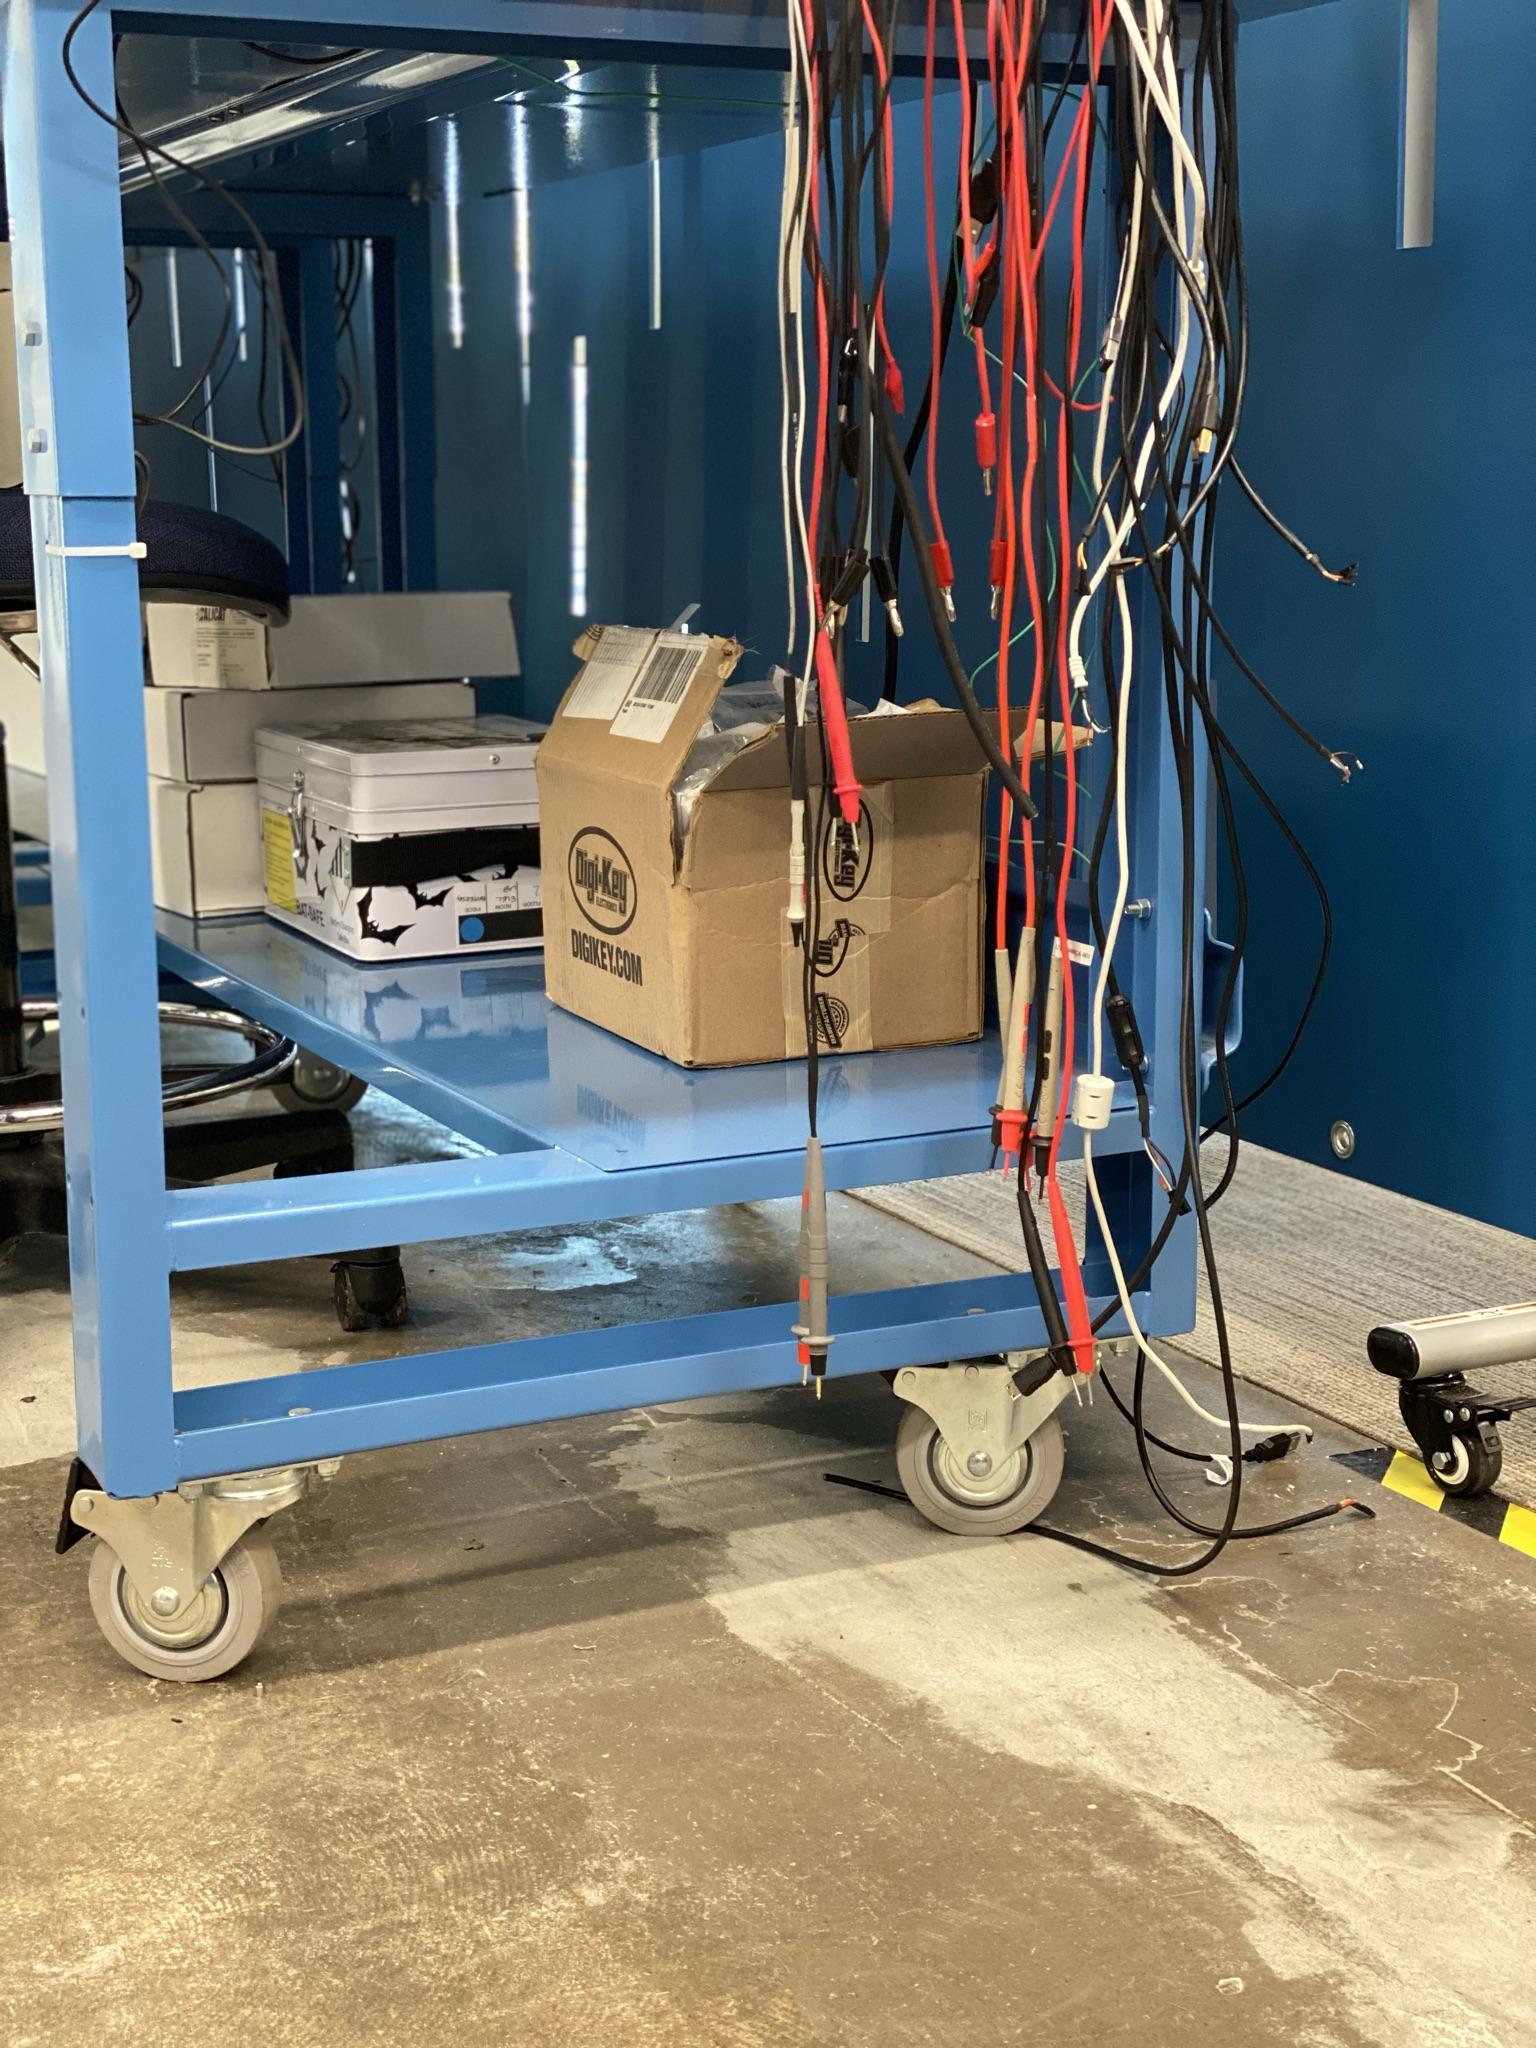 Agile Workspace - Electronics Lab On Wheels